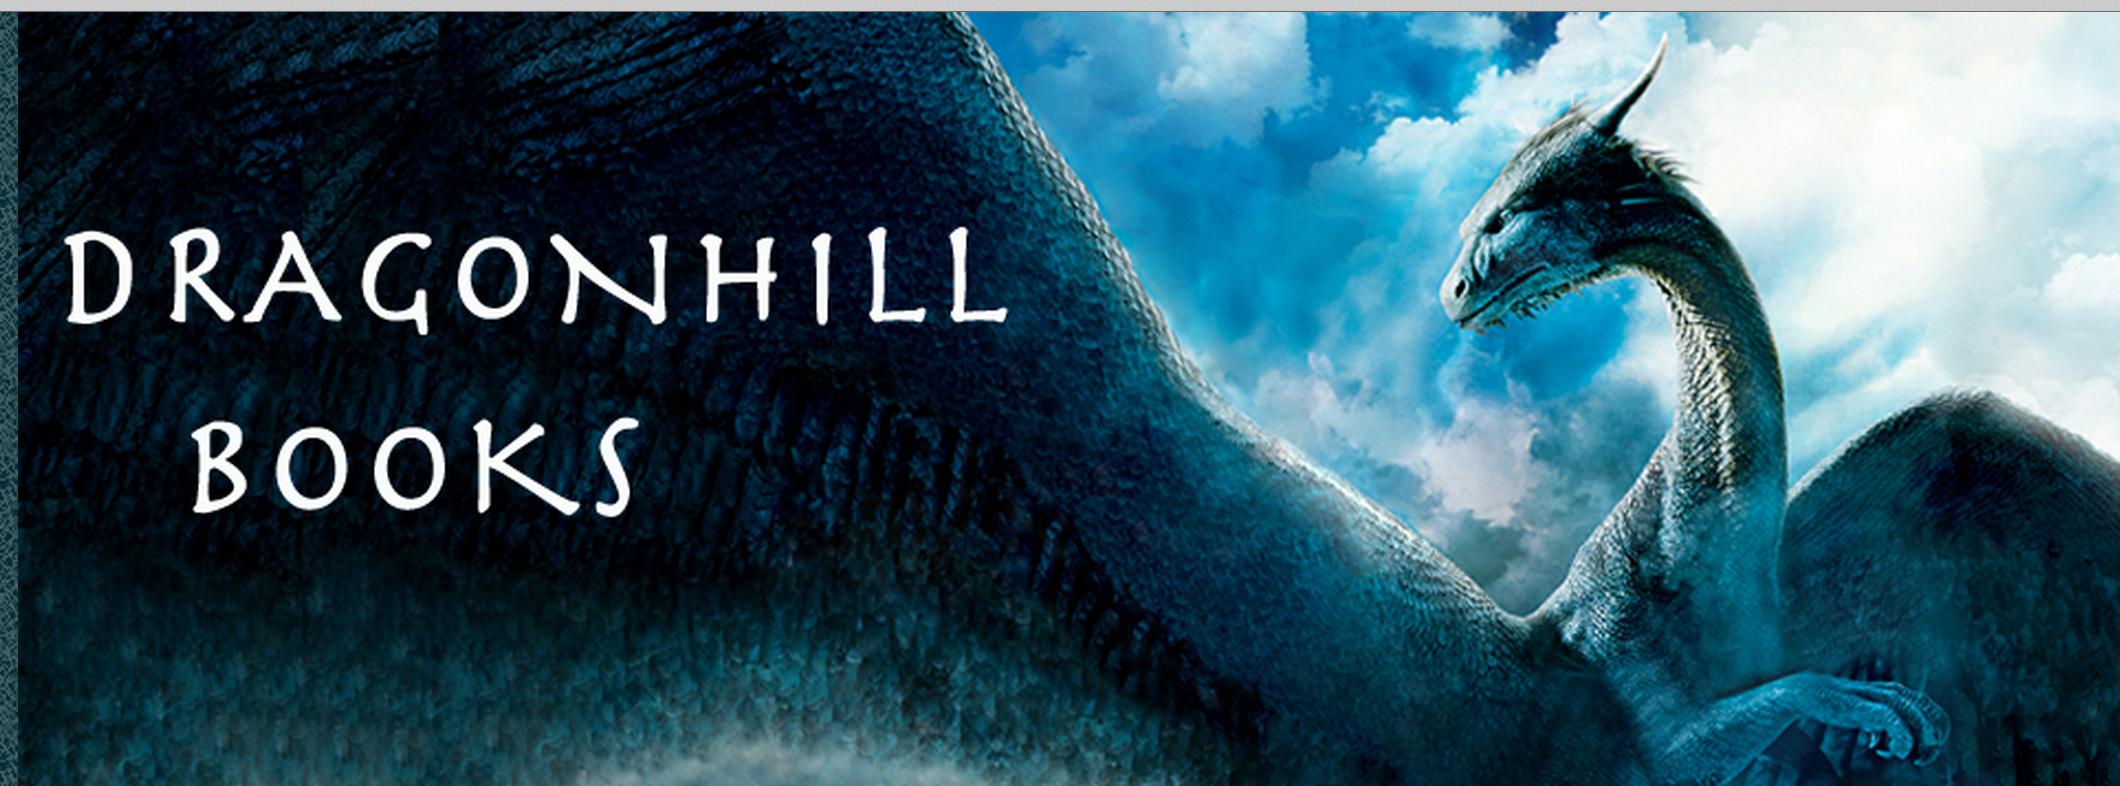 dragonhillbooks.png